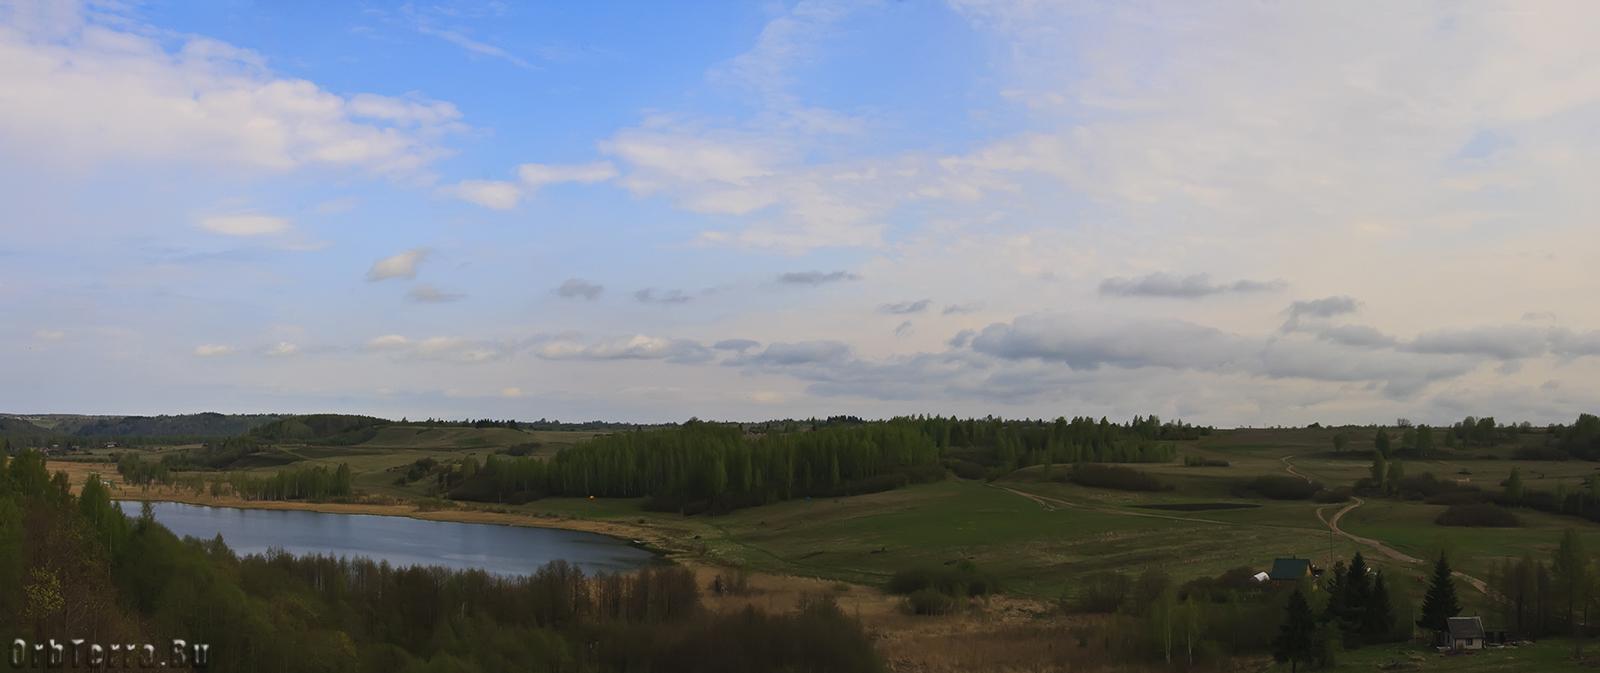 Вид с башни Луковка на Городищенское озеро.